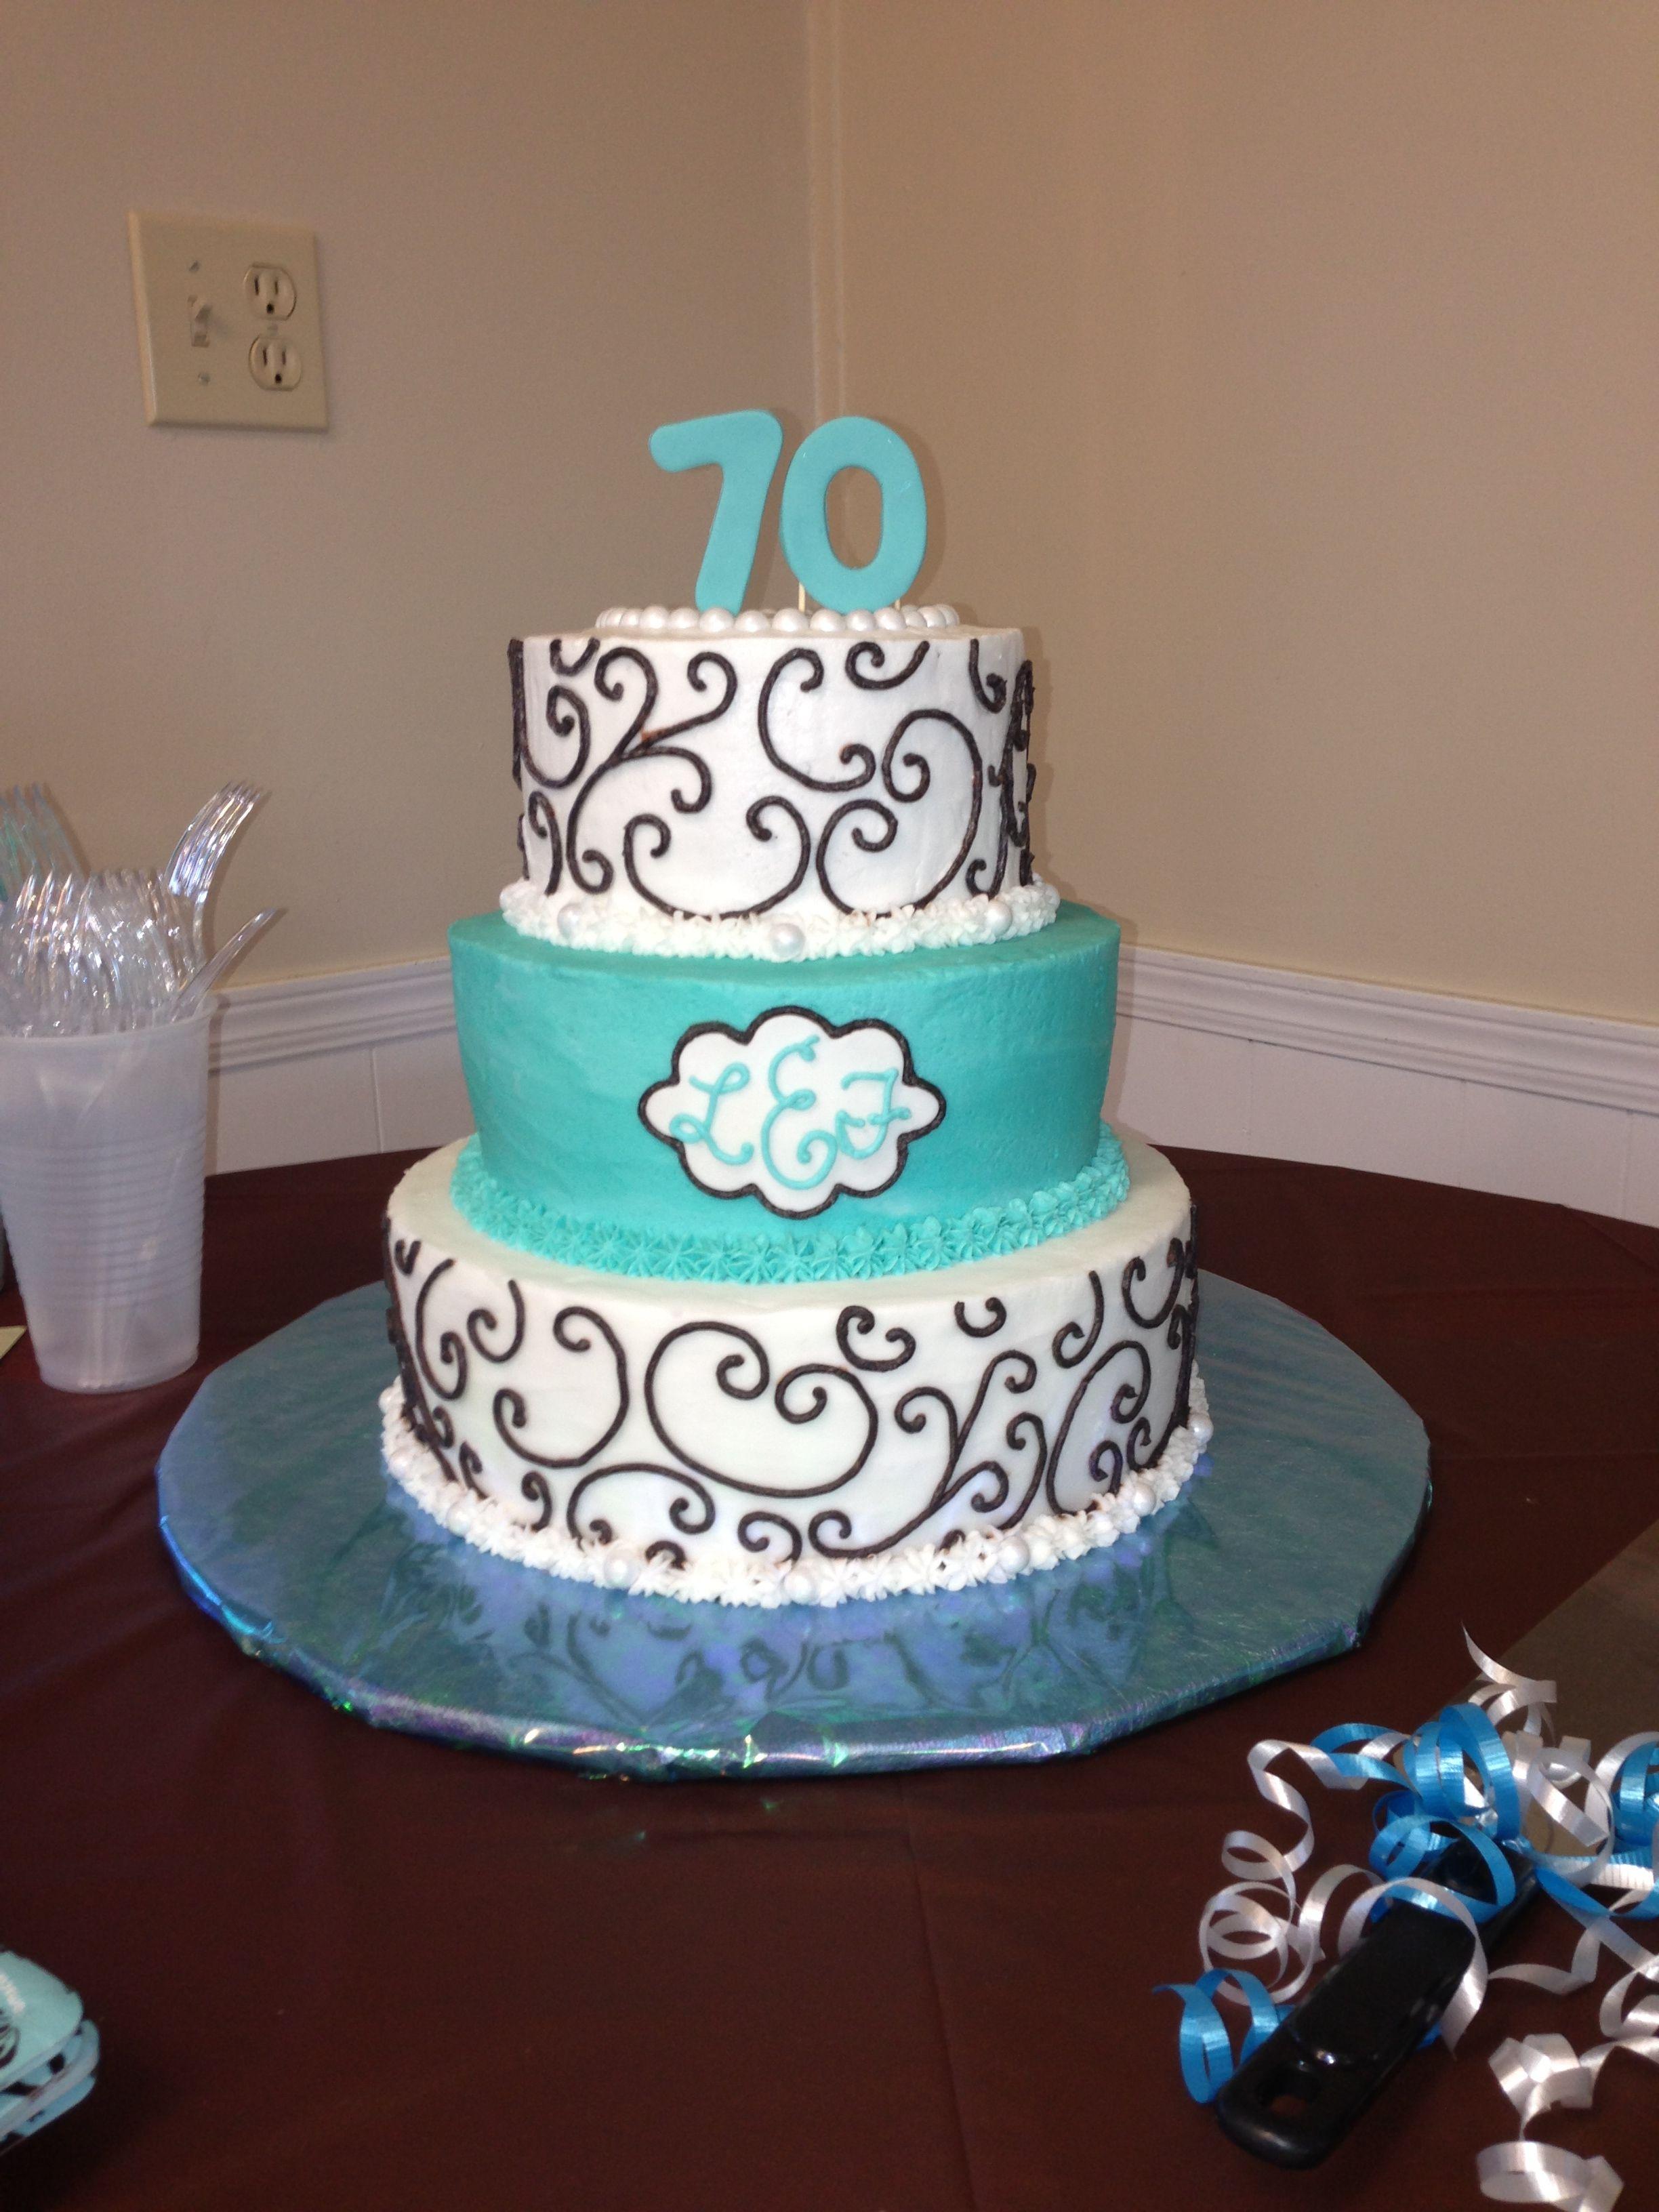 Enjoyable My Grannys 70Th Birthday Cake I Made Mallory Gray 50 Cakes Of Personalised Birthday Cards Sponlily Jamesorg